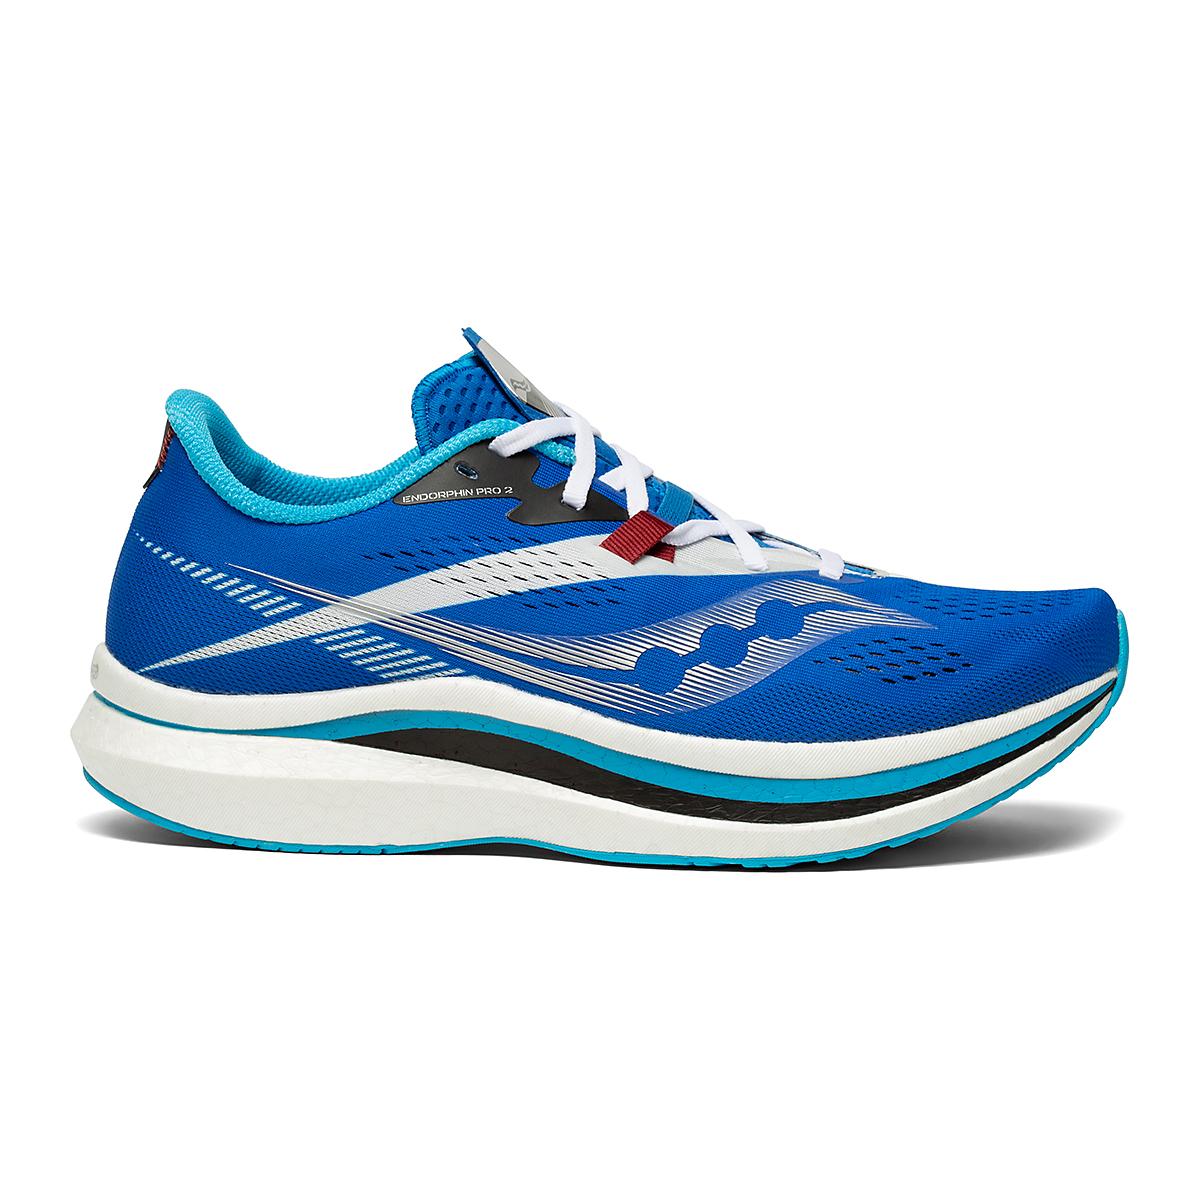 Men's Saucony Endorphin Pro 2 Running Shoe - Color: Royal/White - Size: 7 - Width: Regular, Royal/White, large, image 1